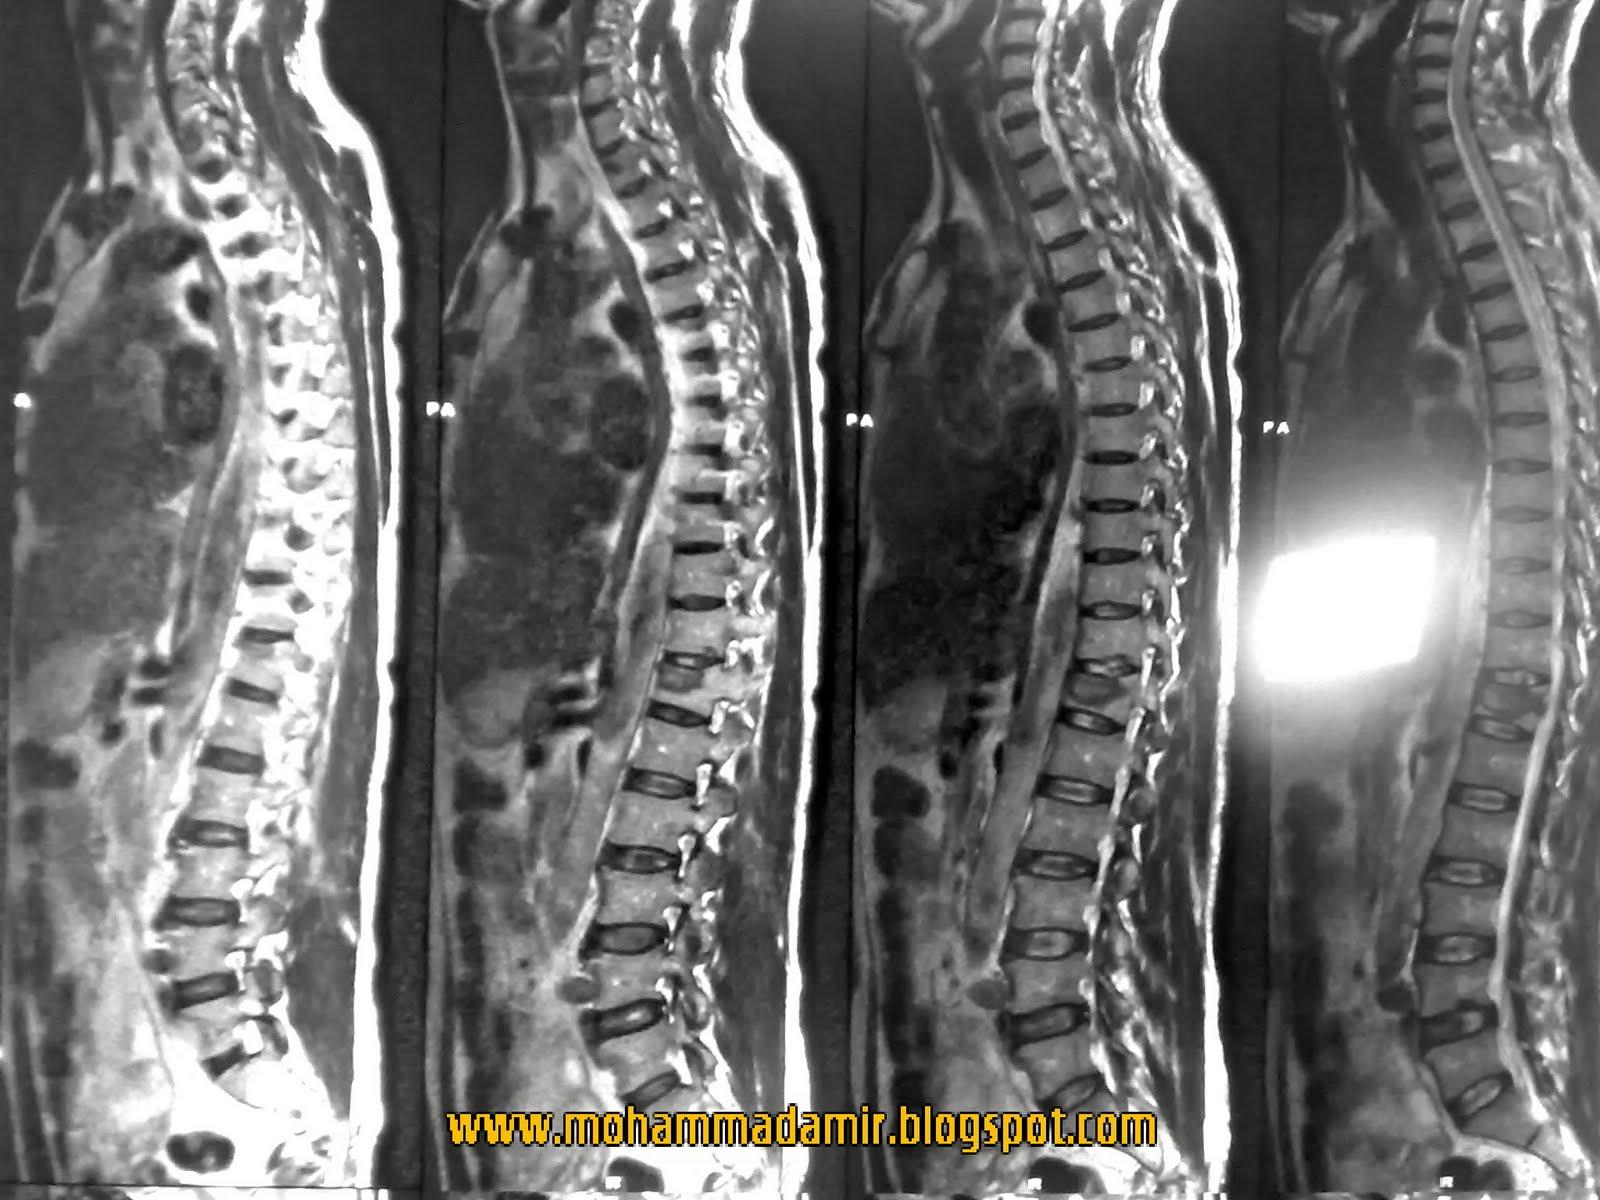 Compression Fracture of Lumbar Vertebrae-3.bp.blogspot.com